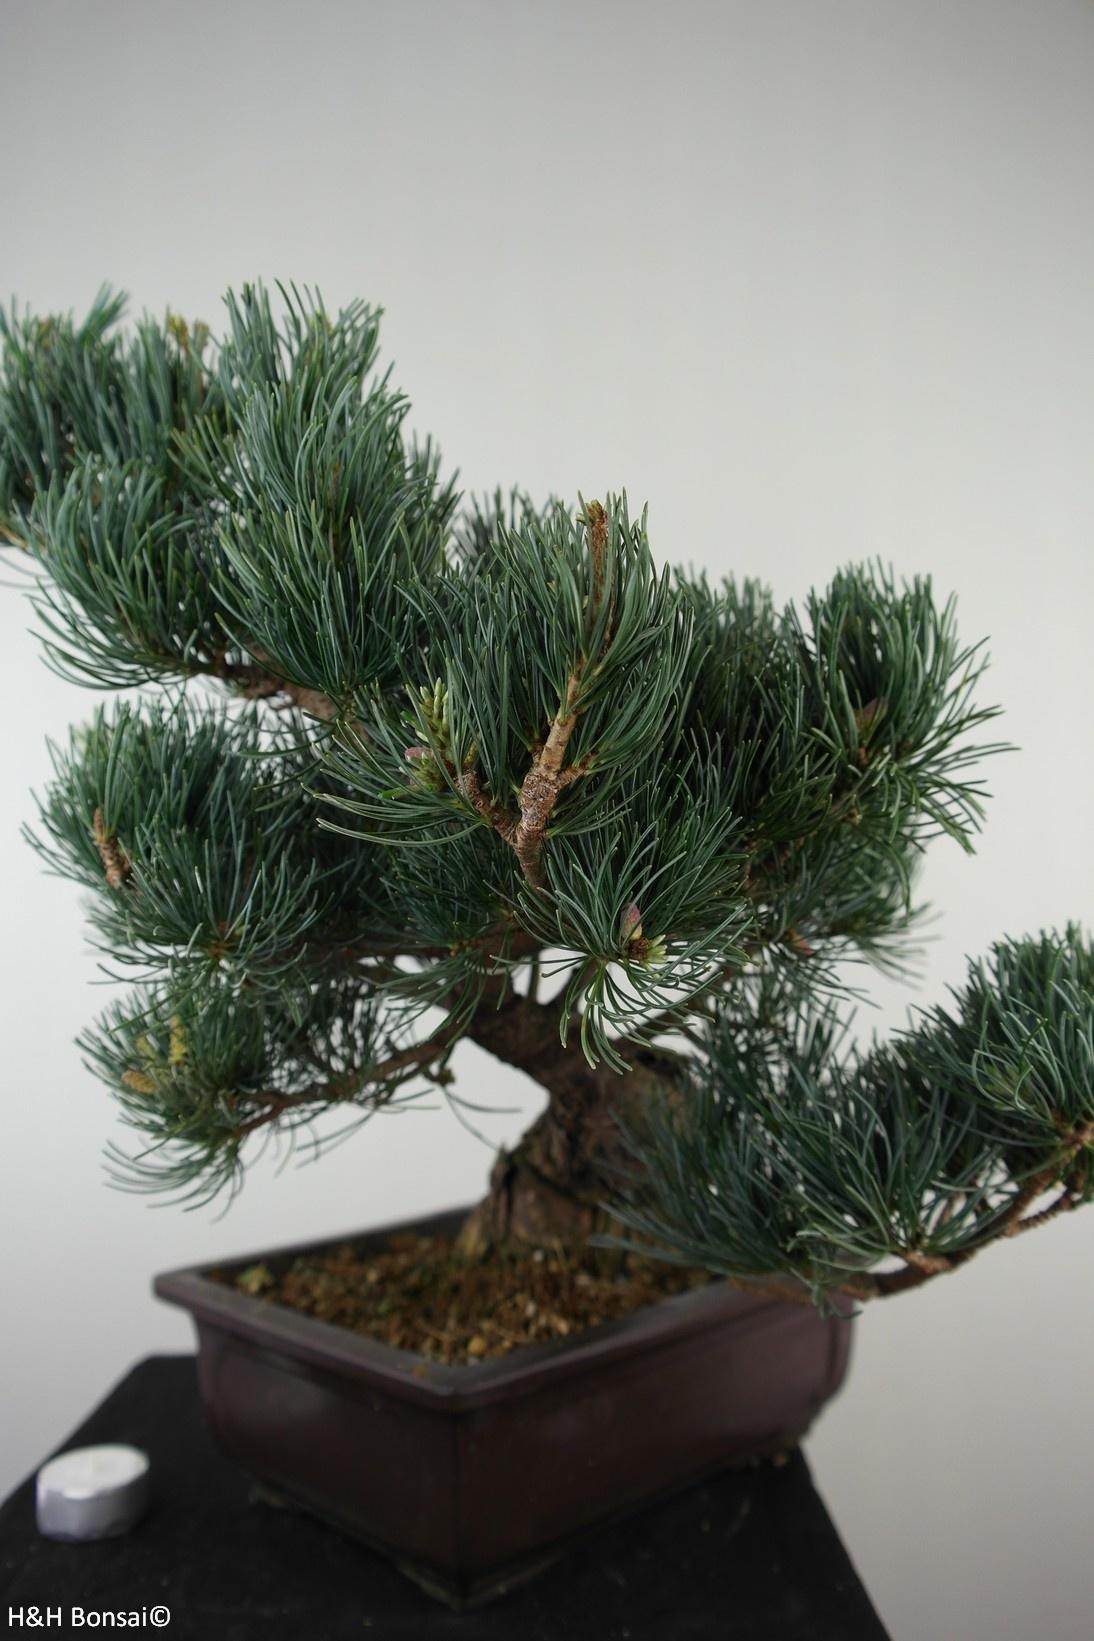 Bonsai Mädchenkiefer, Pinus pentaphylla, nr. 7813